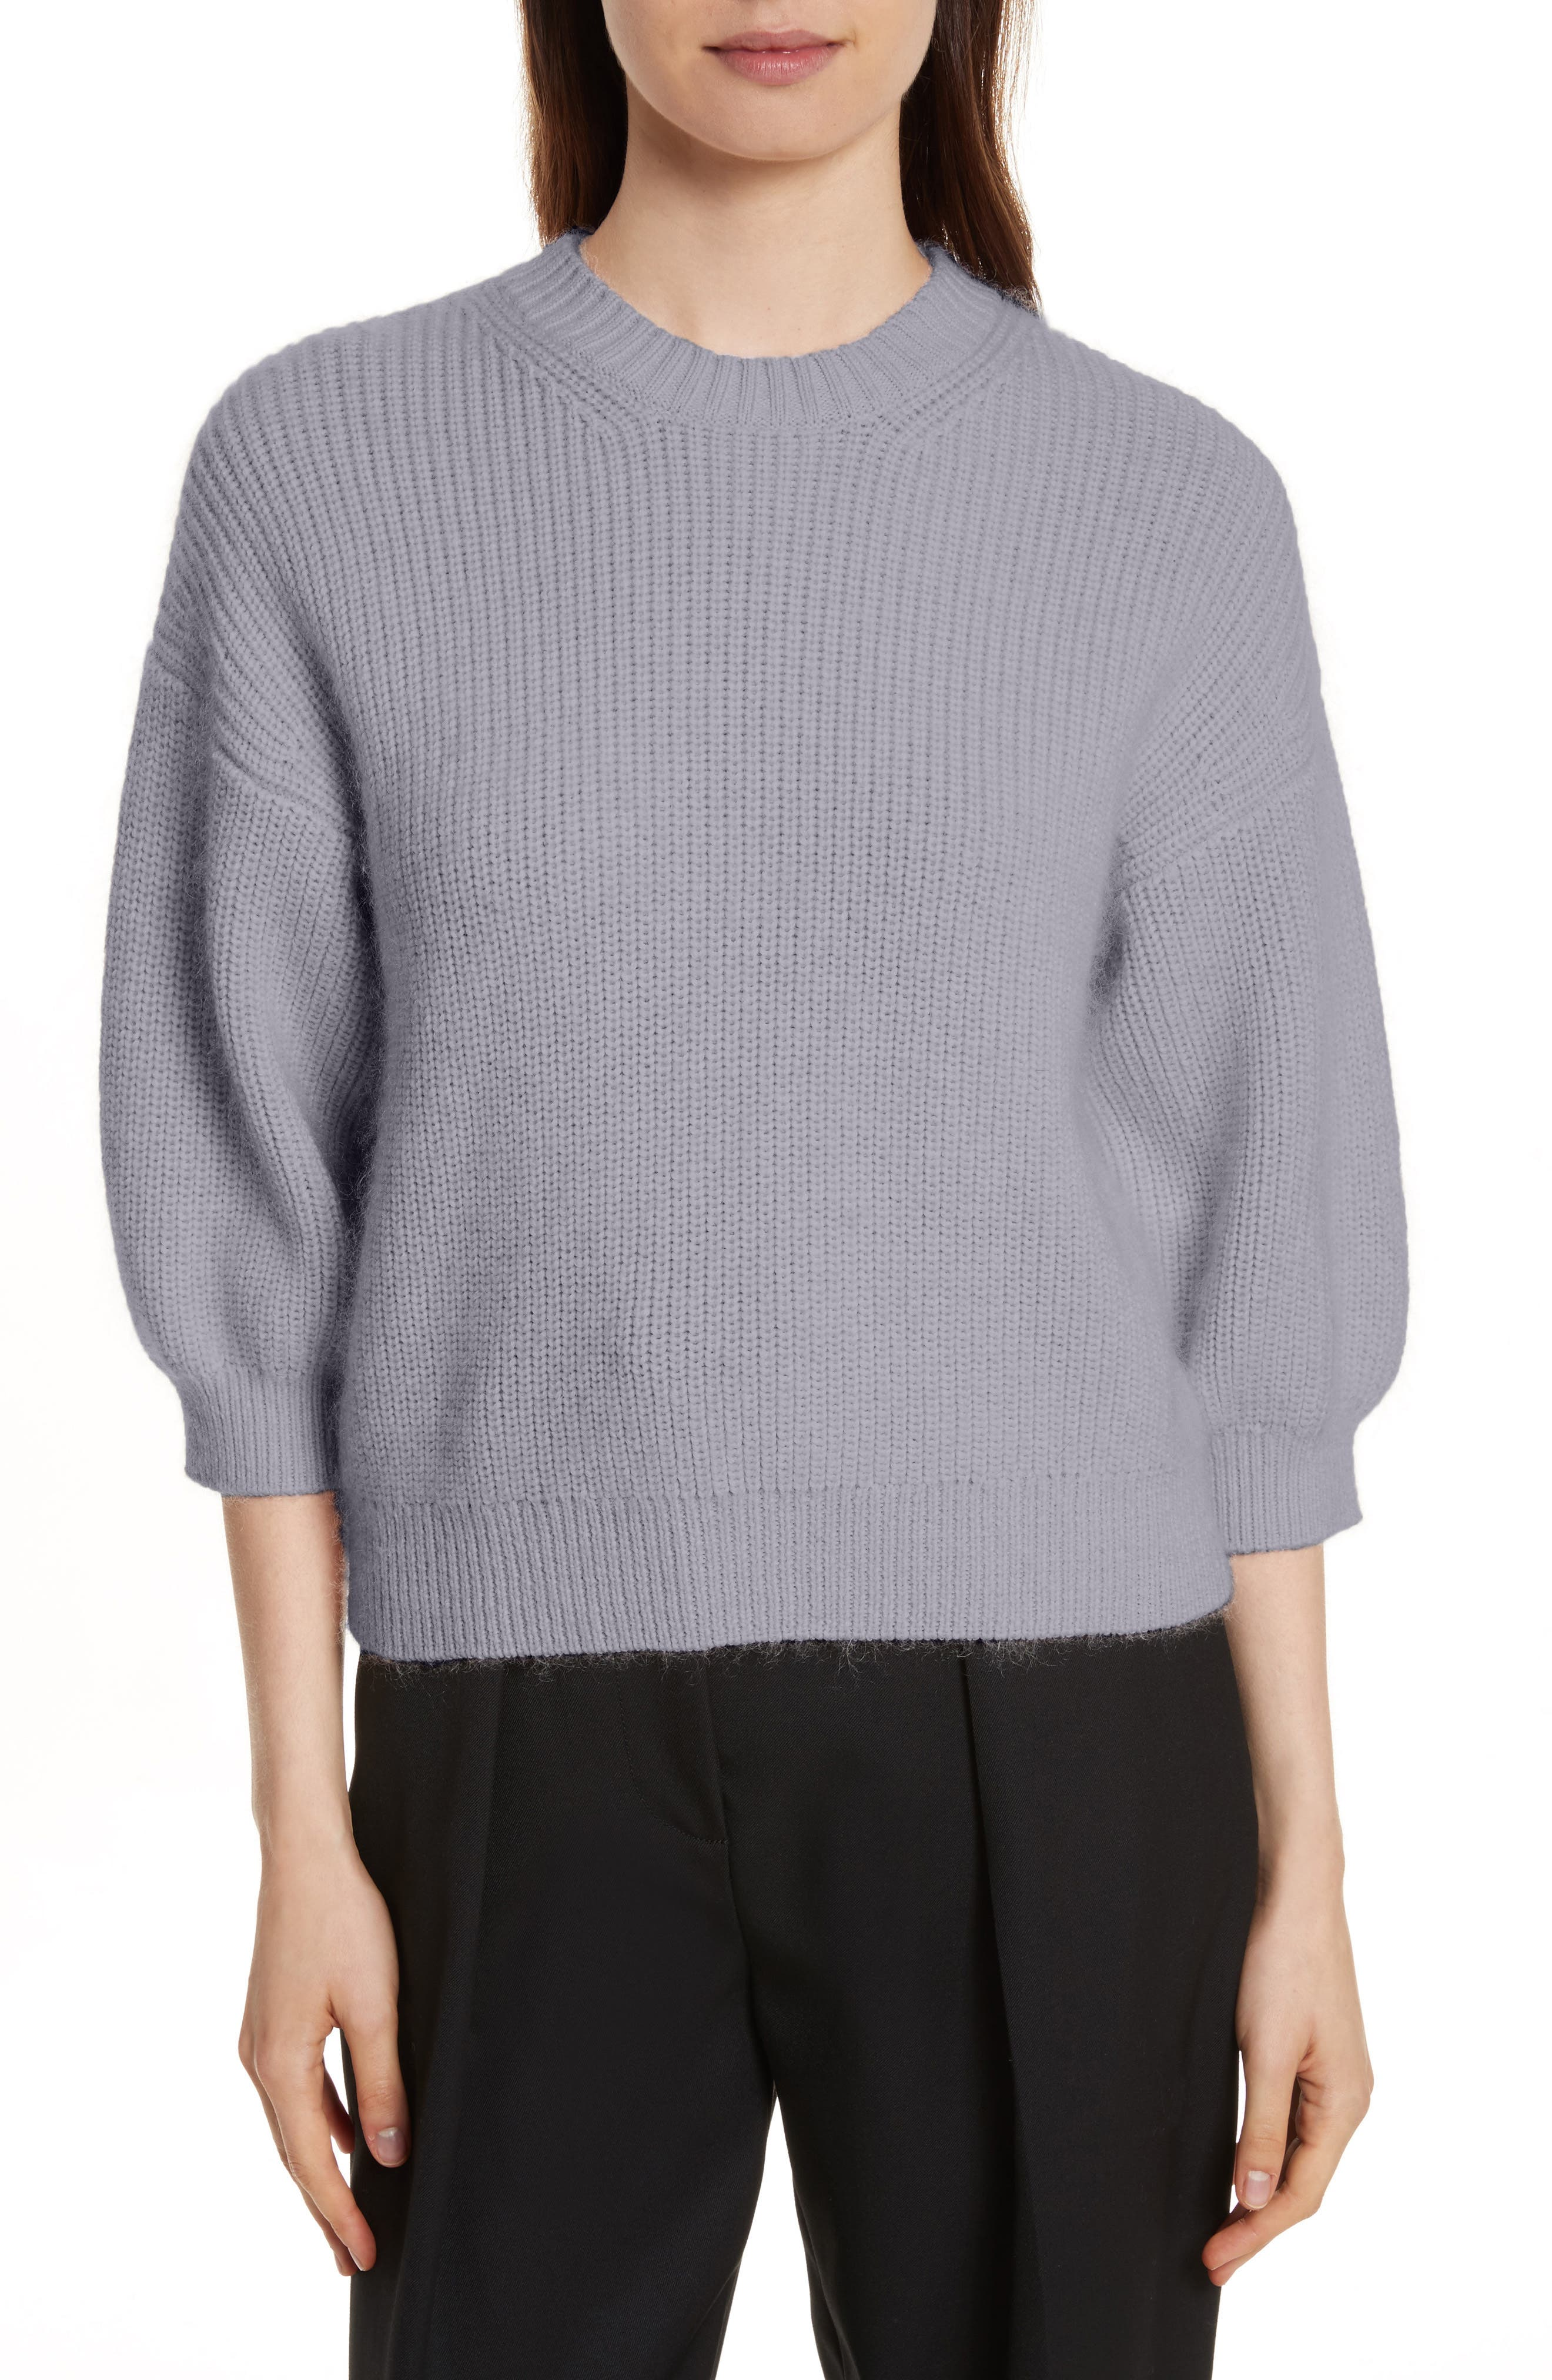 Main Image - 3.1 Phillip Lim Puff Sleeve Wool & Mohair Blend Sweater